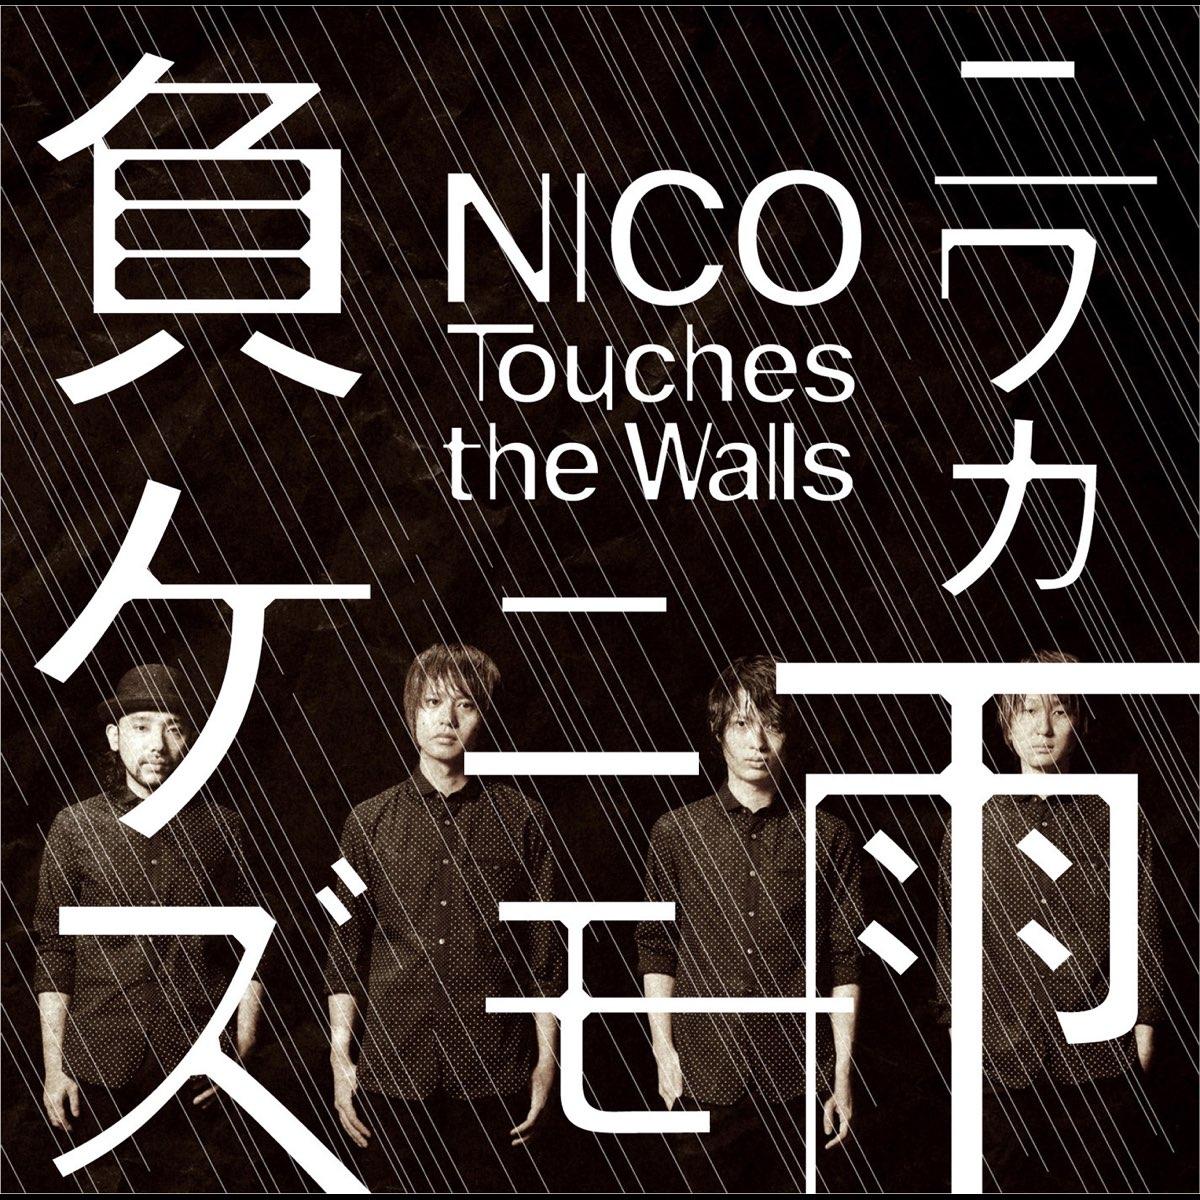 『NICO Touches the Walls - ニワカ雨ニモ負ケズ』収録の『ニワカ雨ニモ負ケズ』ジャケット